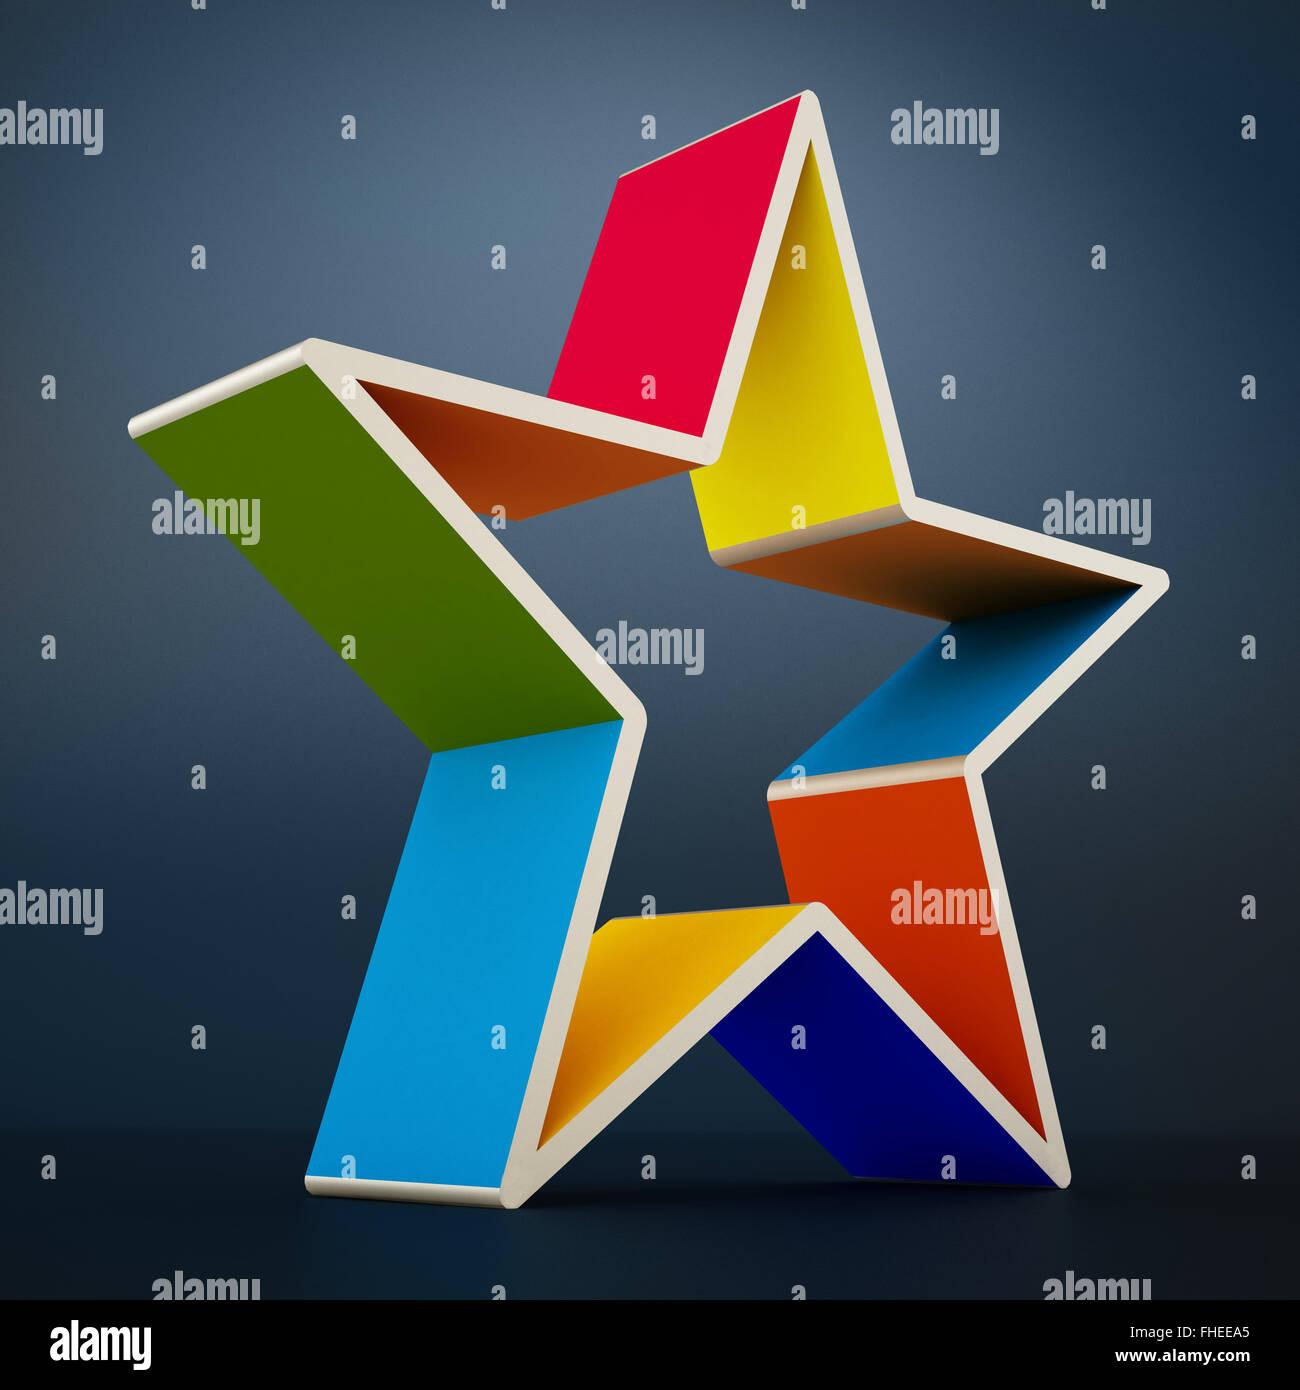 Multi colored star shape isolated on black  background. - Stock Image